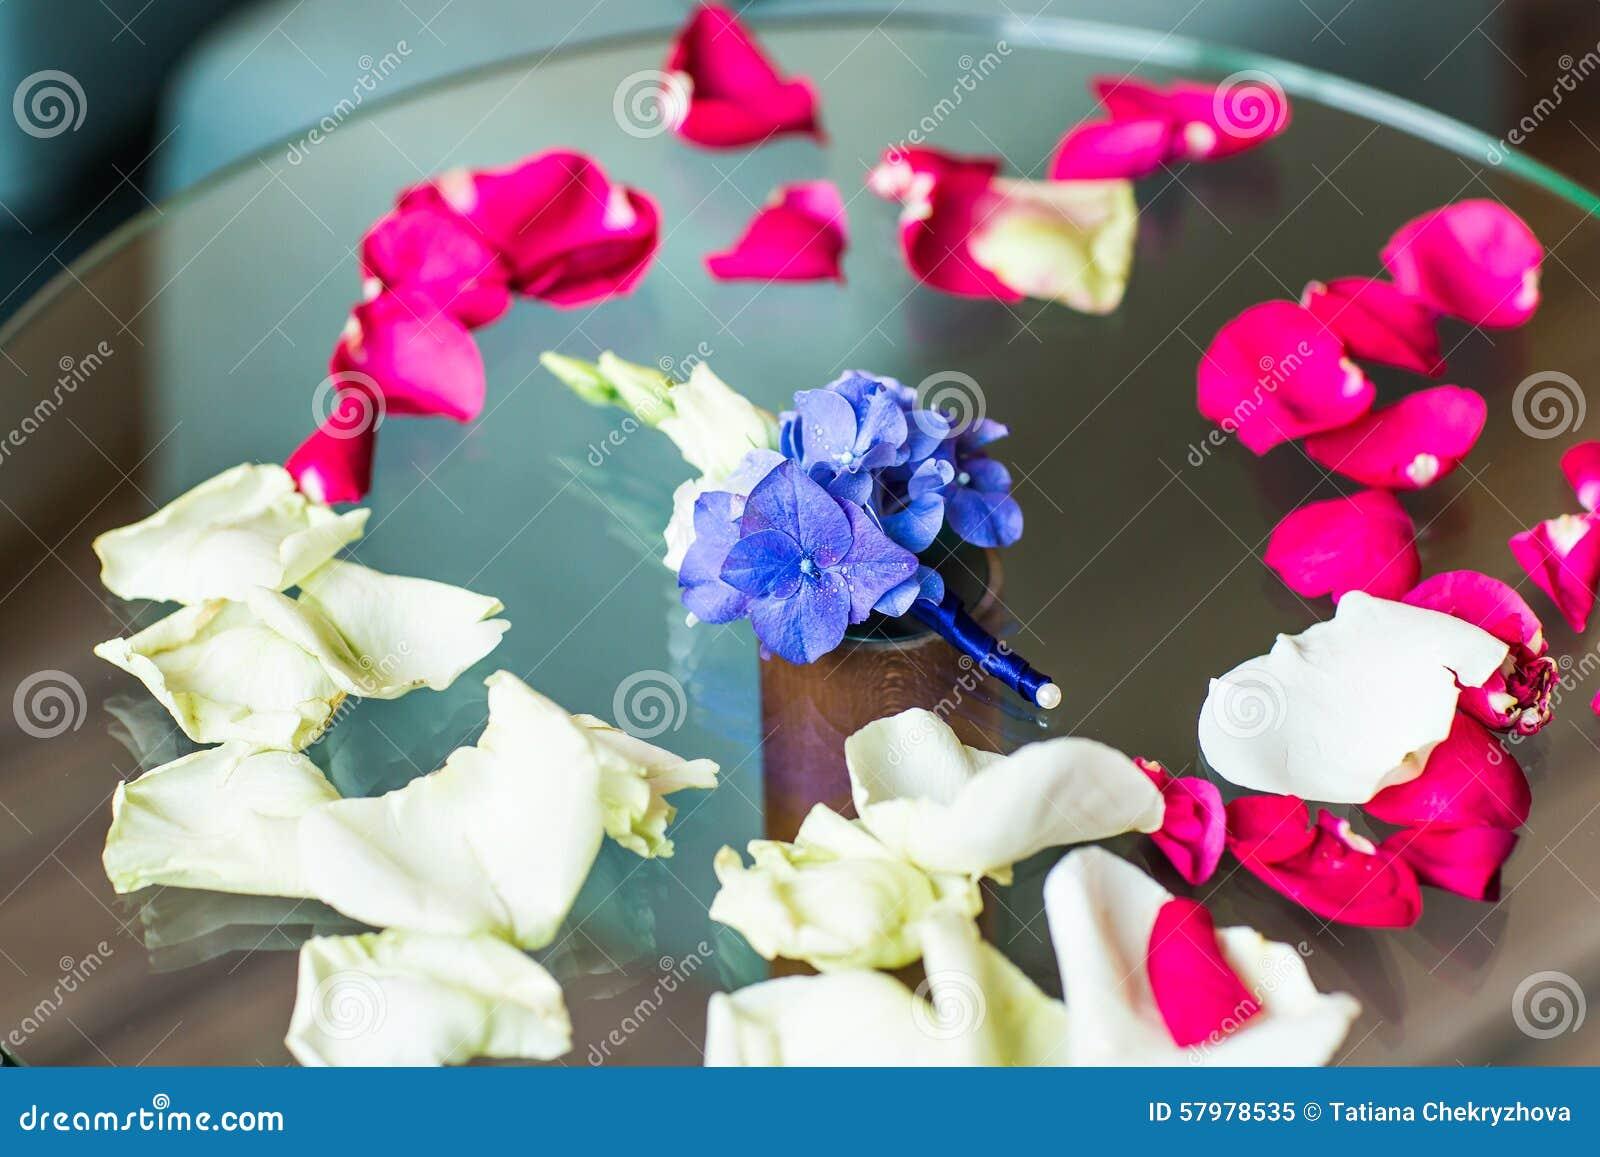 Boutonniere van de bruidegom